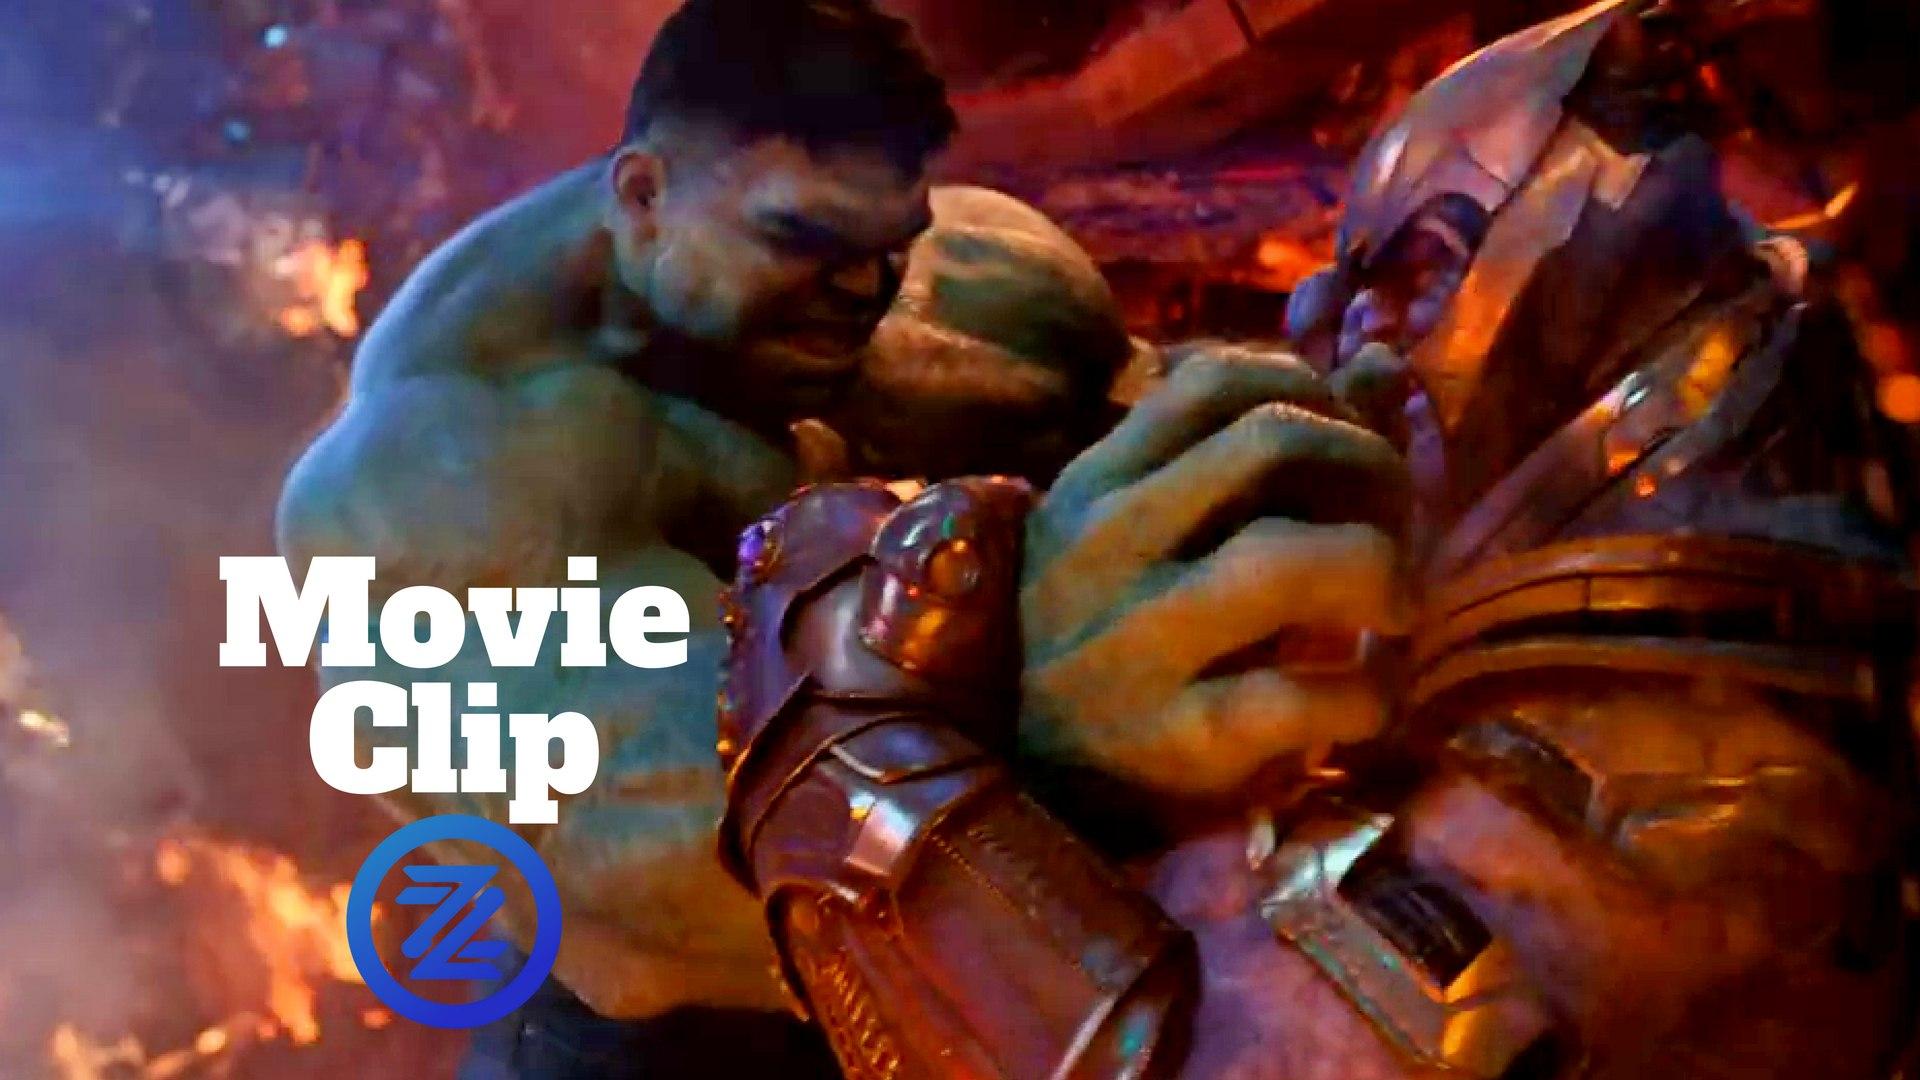 Avengers Infinity War Movie Clip   Hulk Vs Thanos Fight Scene 1920x1080